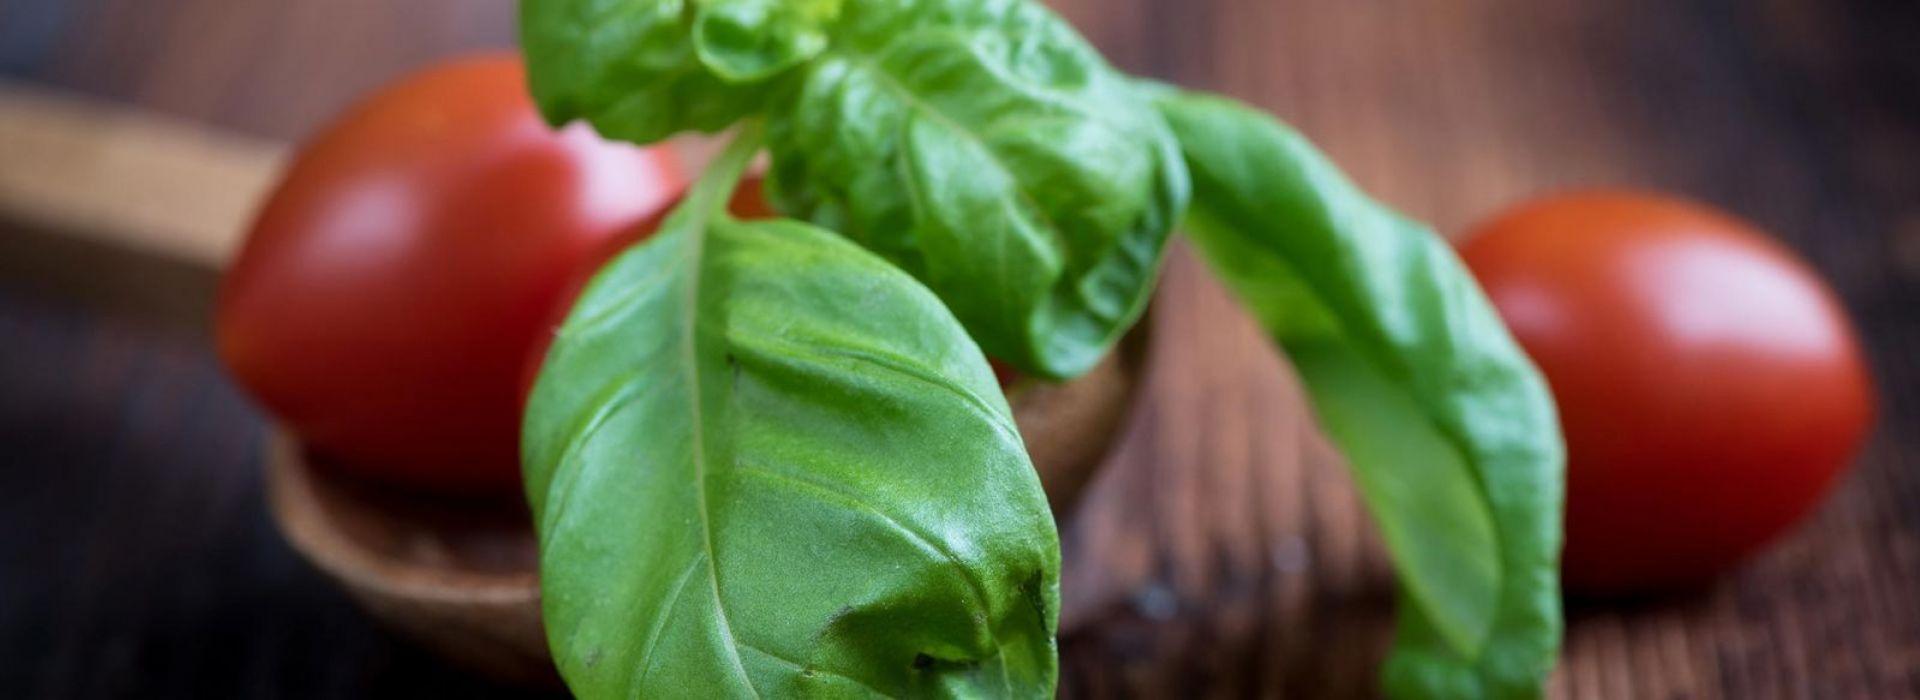 Herb Basil Green & Red